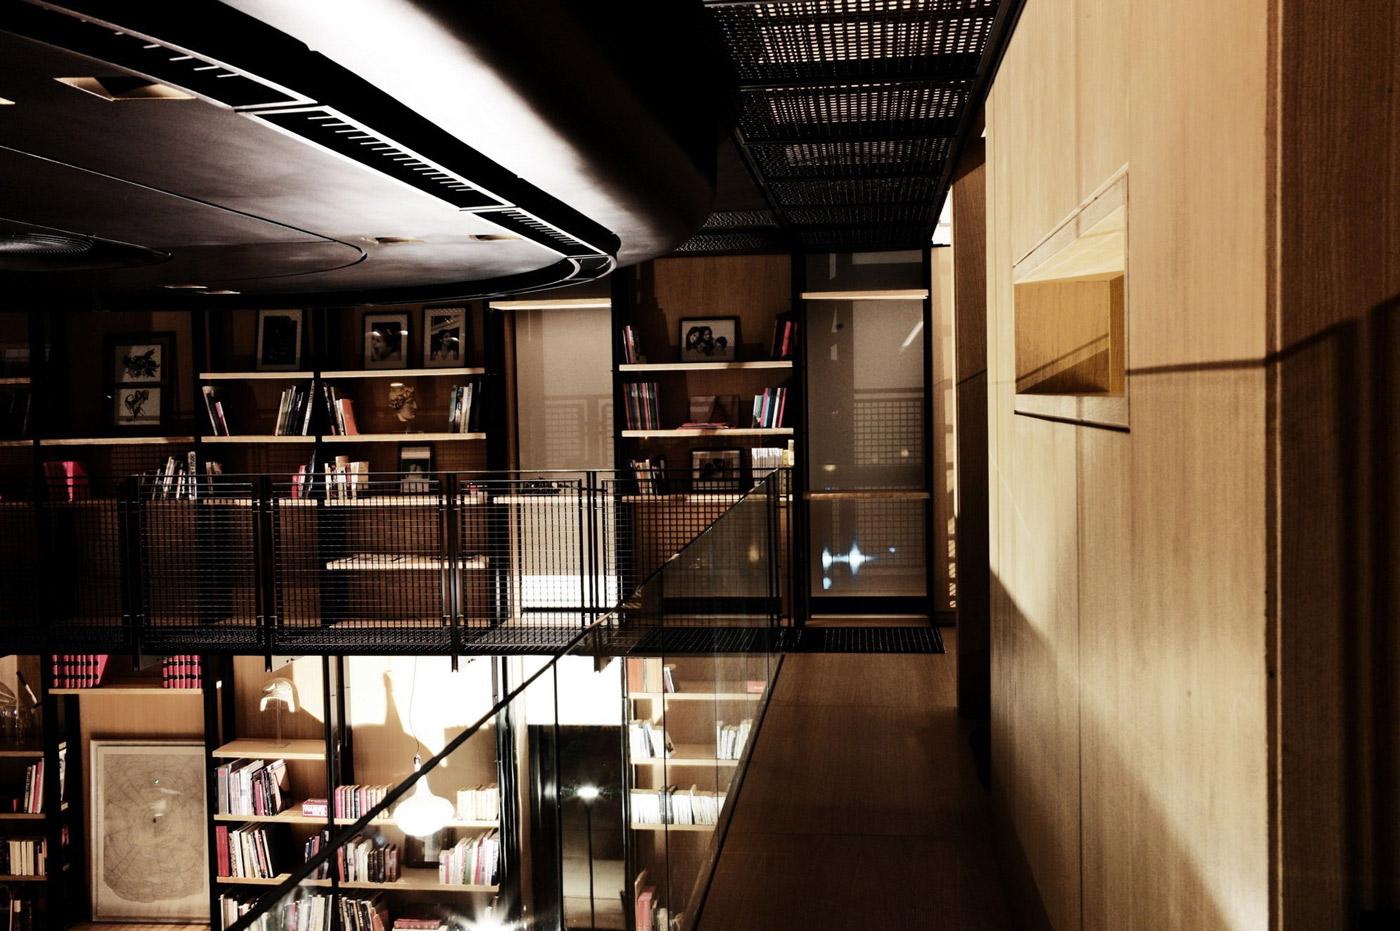 Shelves, Penthouse Apartment in Beirut, Lebanon